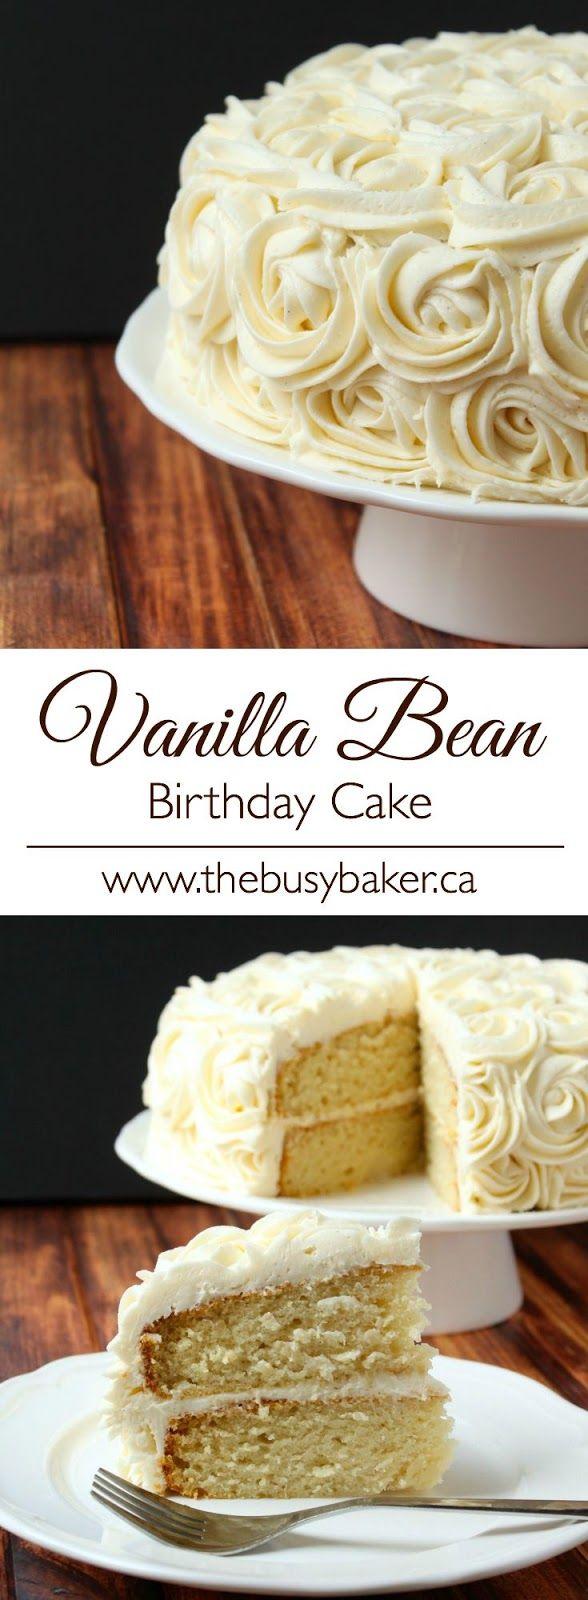 The Busy Baker: Vanilla Bean Birthday Cake